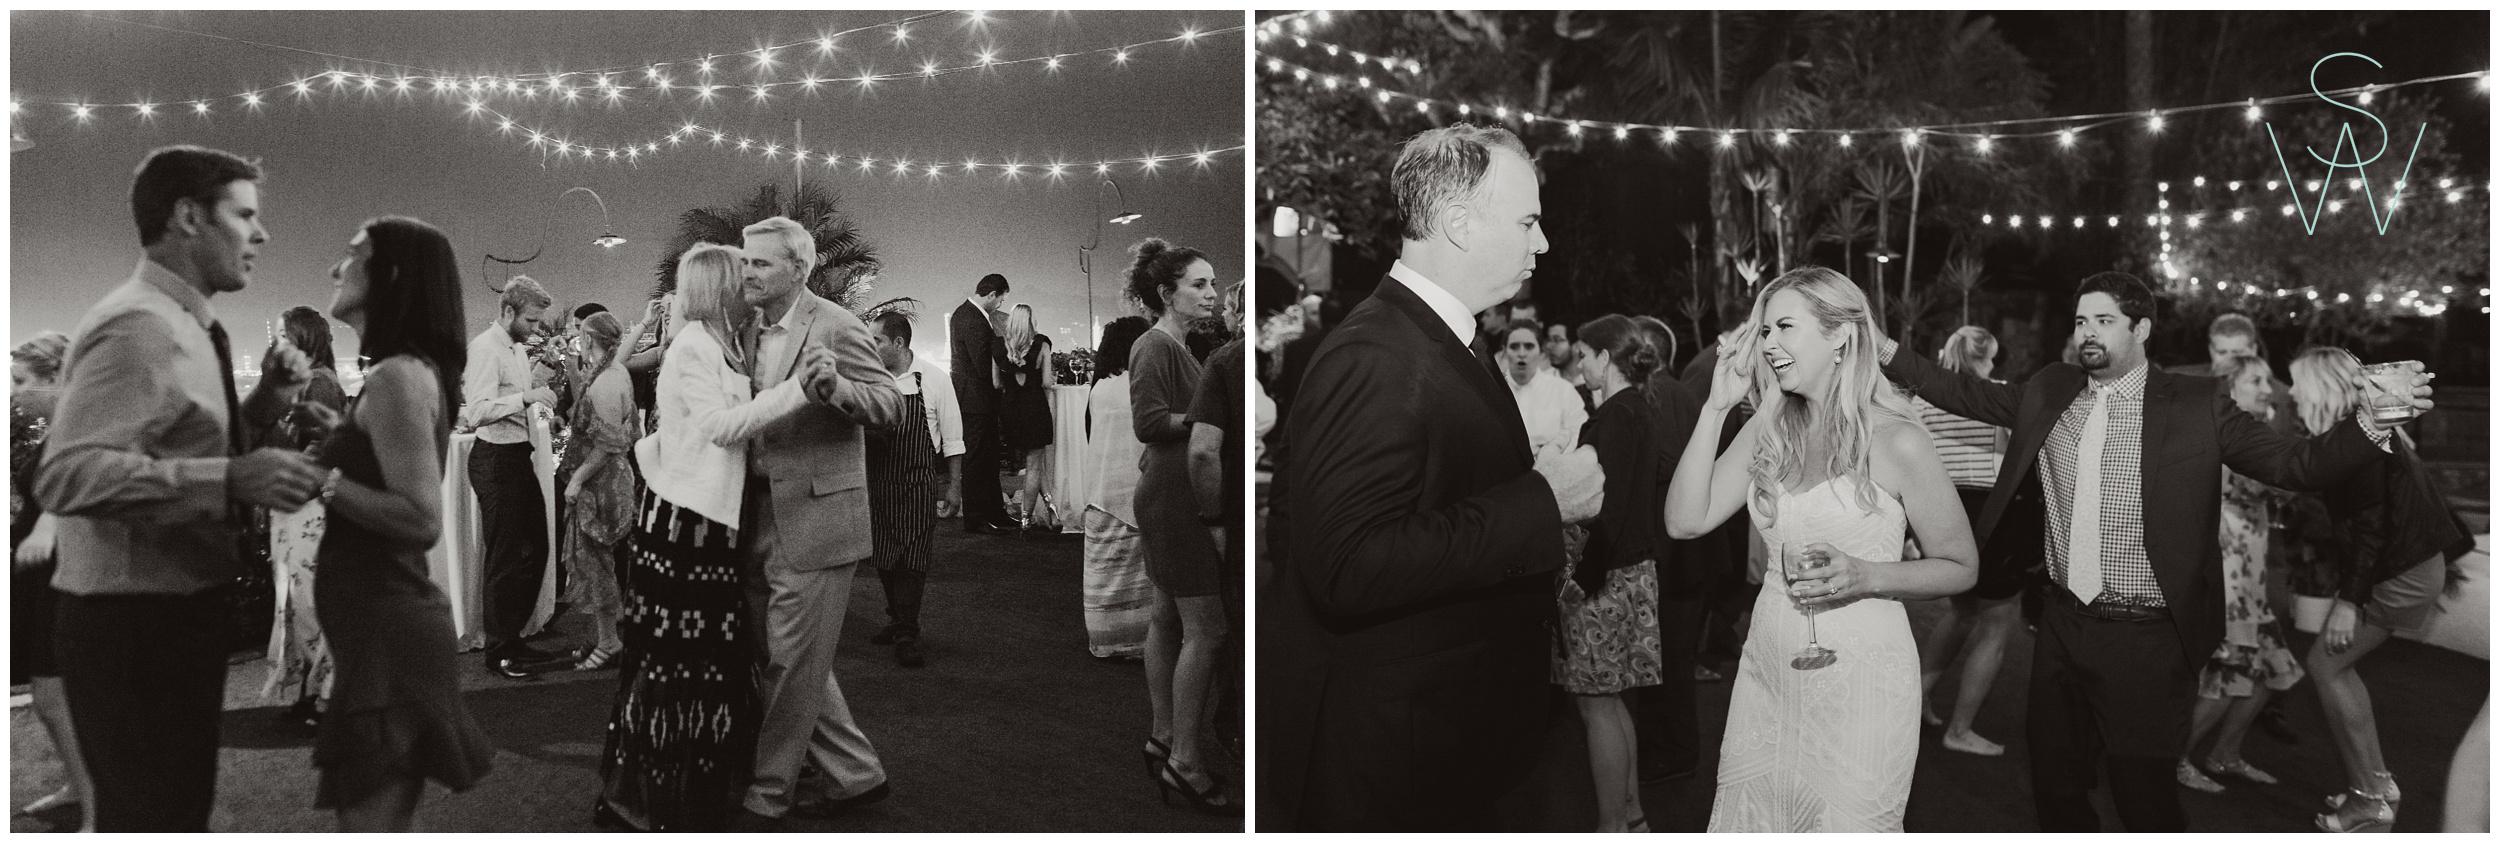 shewanders.san.diego.wedding.brigatine.isari-196.jpg